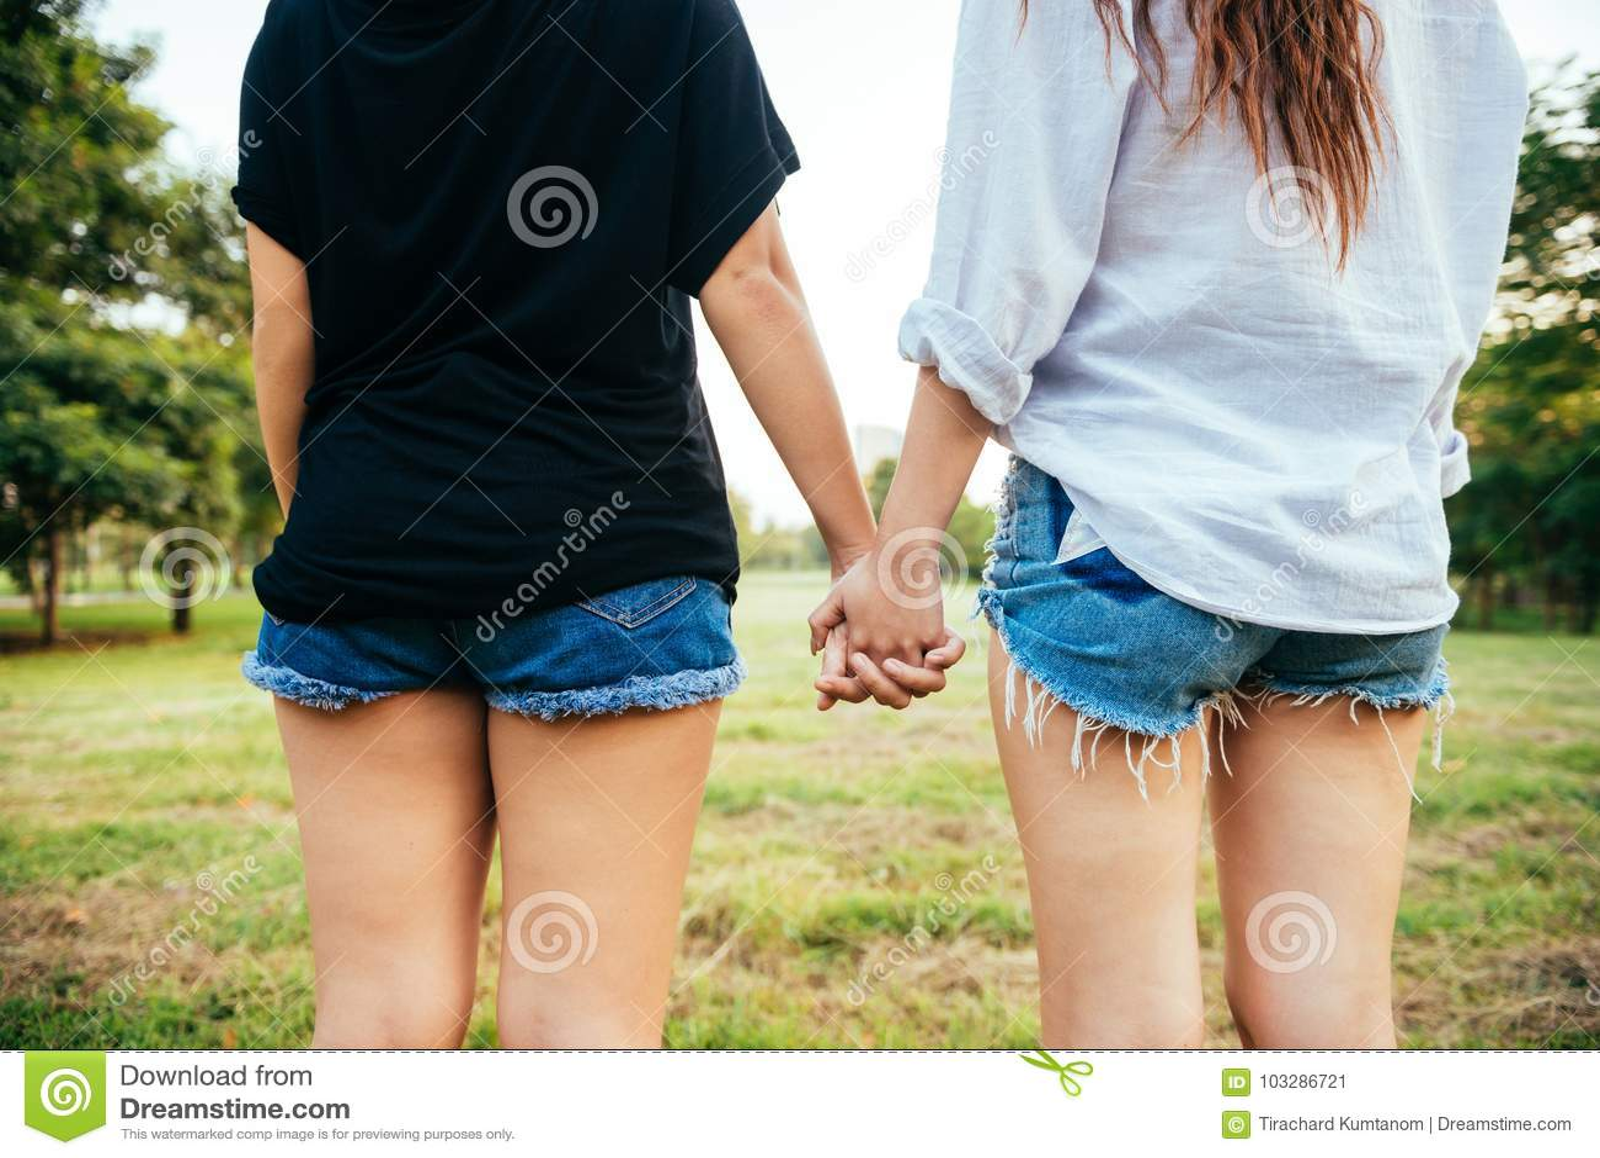 Bonheur lesbien de moments de couples de femmes de LGBT De femmes de couples concept lesbien ensemble dehors